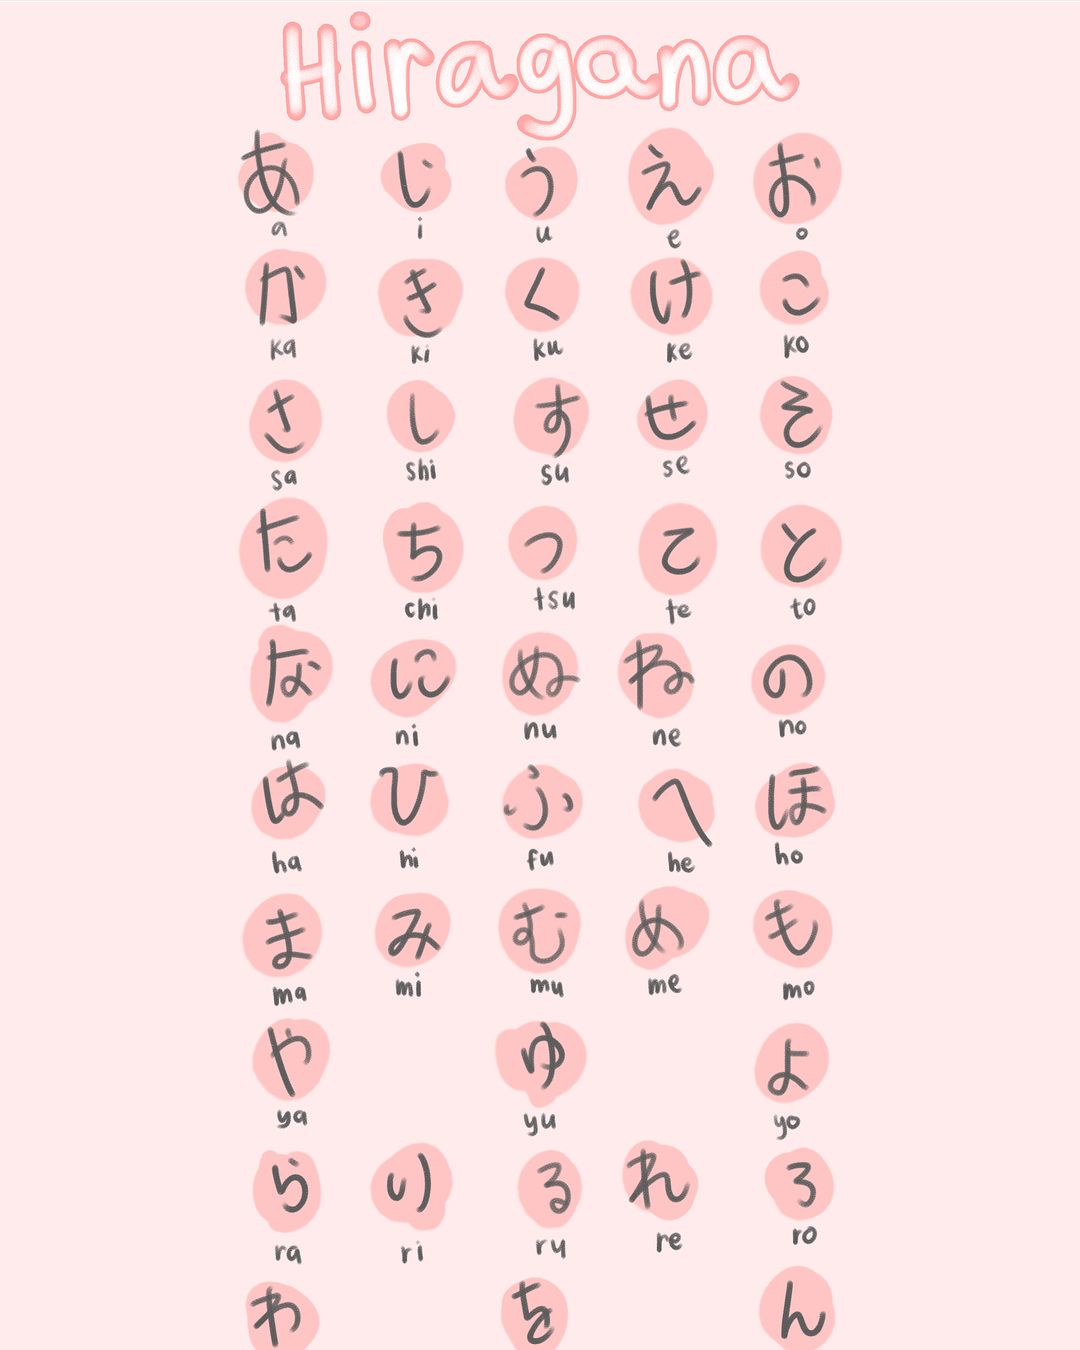 Language Hiragana: This Is A Japanese Language Study Guide For Hiragana